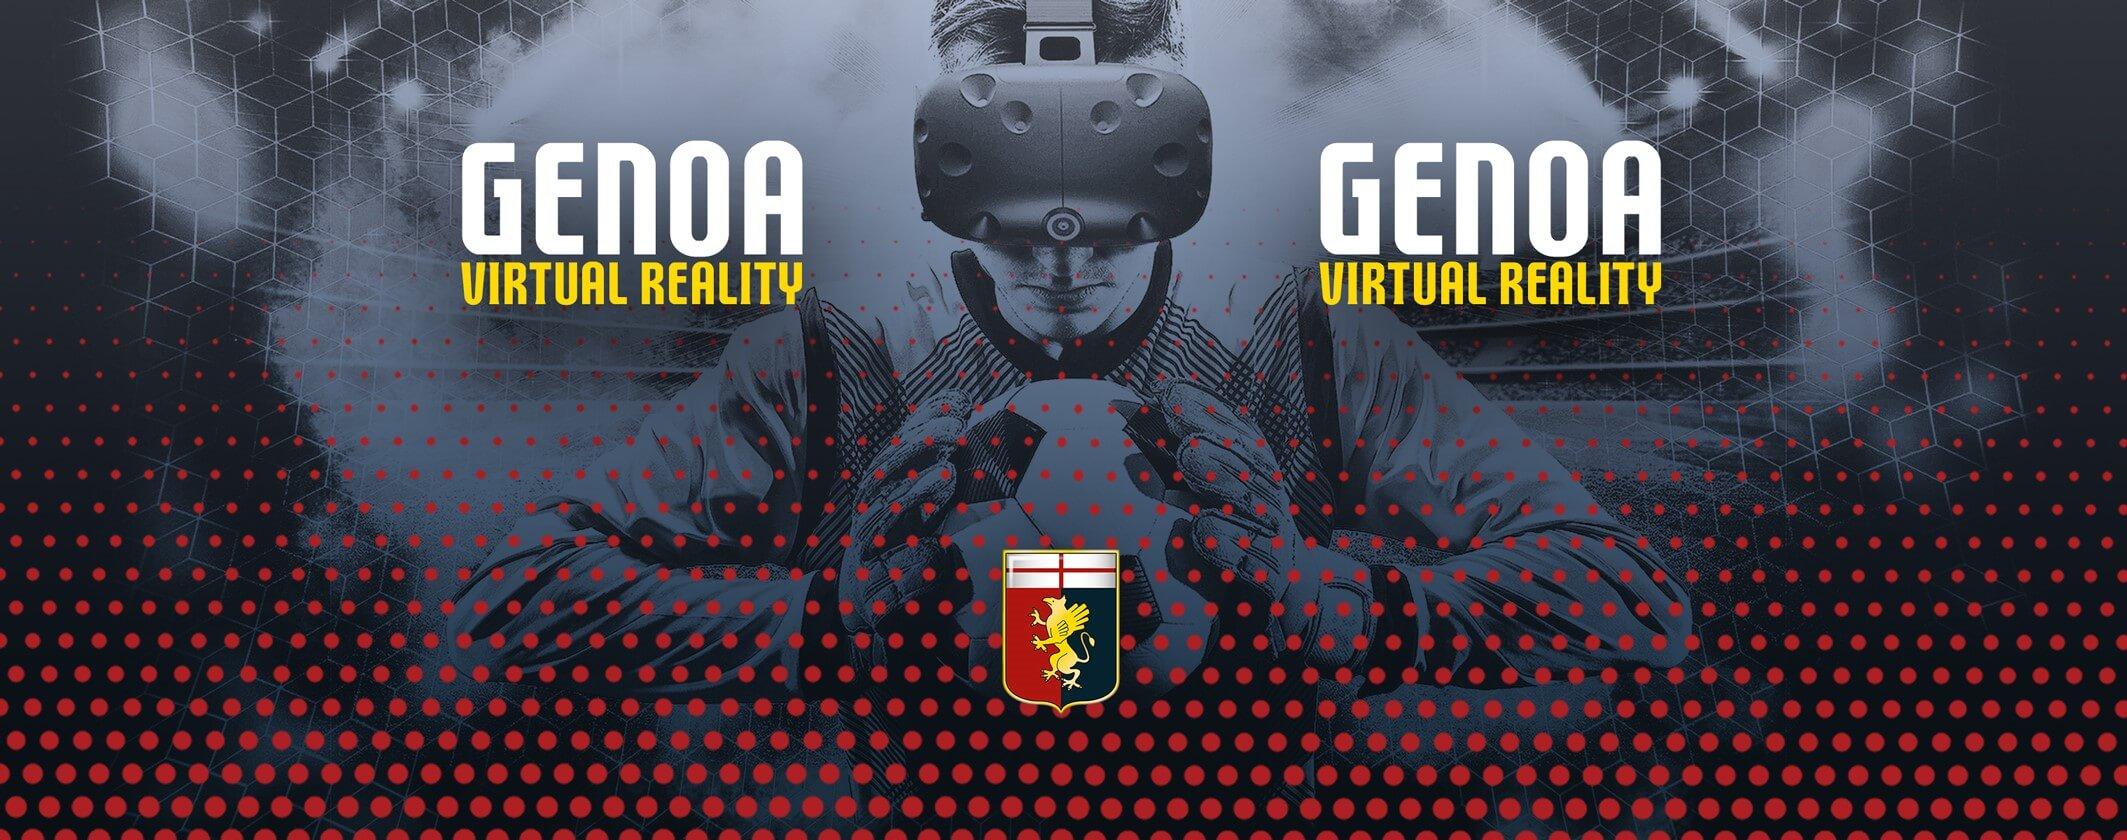 Genoa Virtual Reality